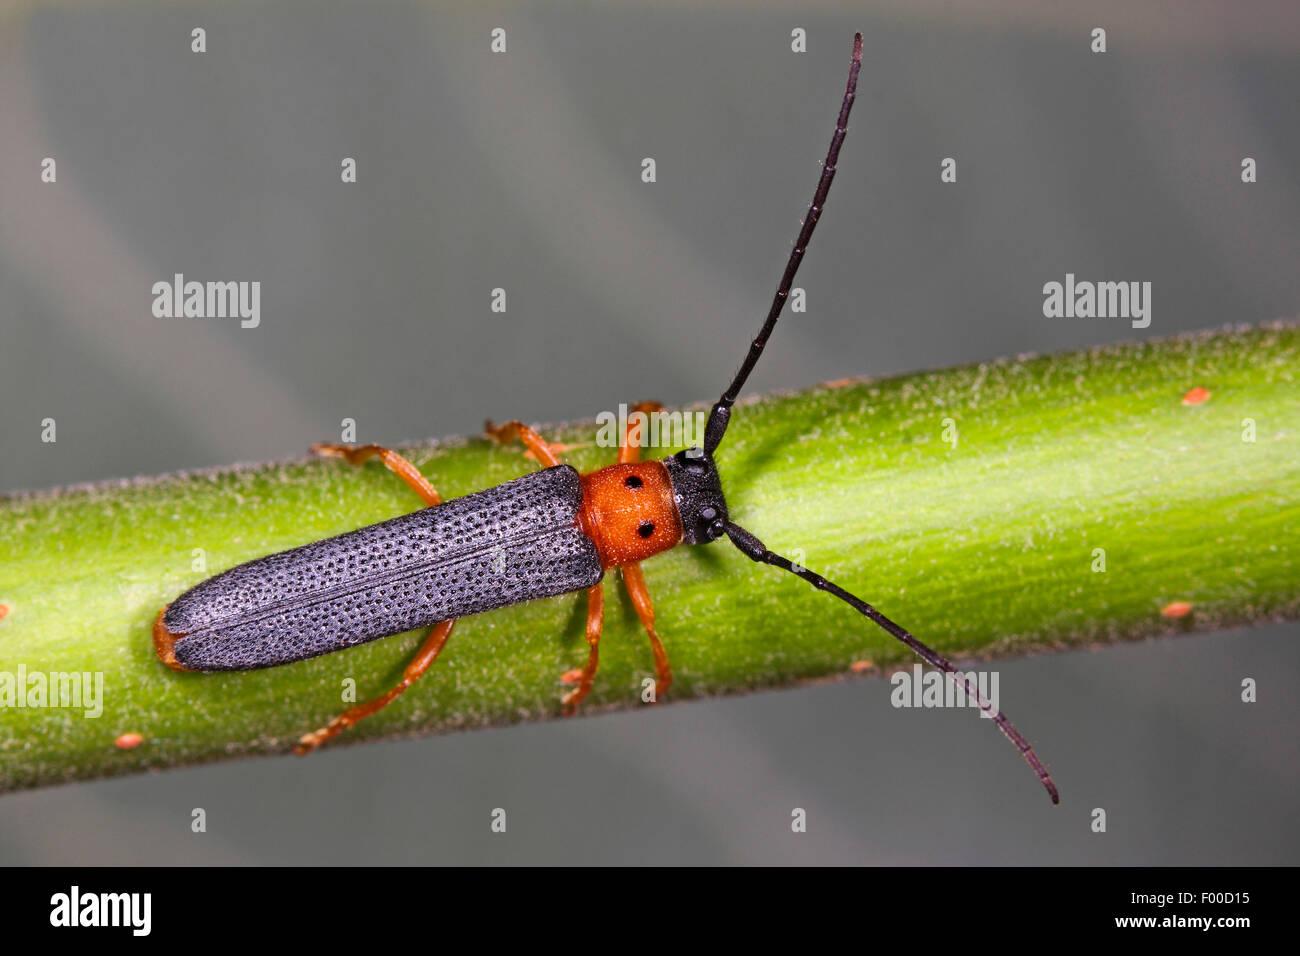 Twin spot longhorn beetle (Oberea oculata), on a twig, Germany - Stock Image